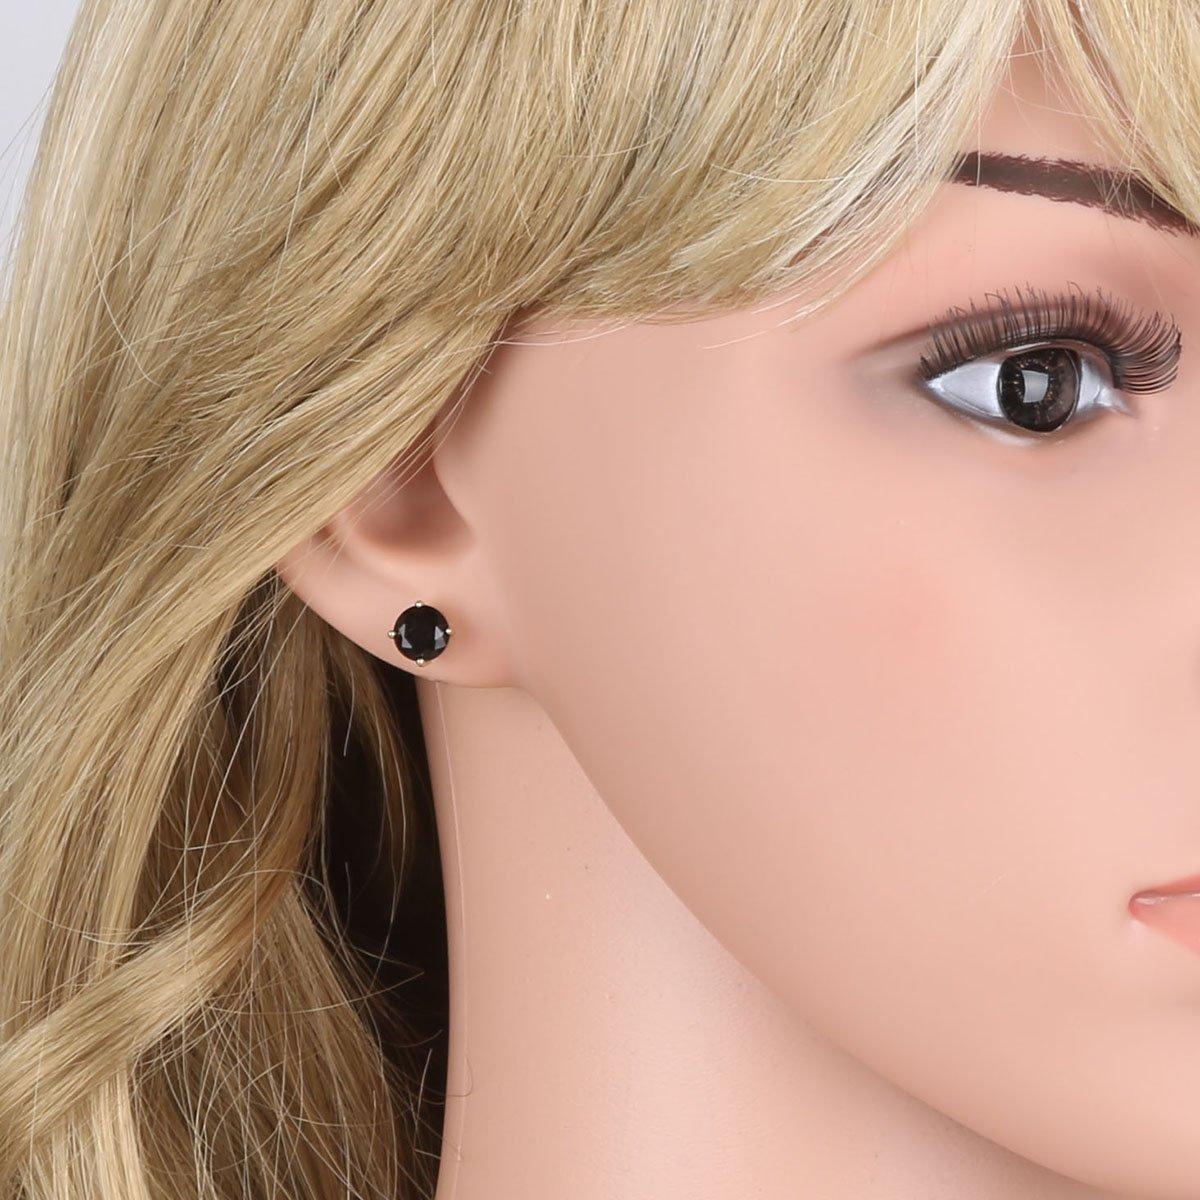 14K Gold Plated Simple Black Rhinestone Stud Earrings Cubic Zirconia for Women Girls Jewelry